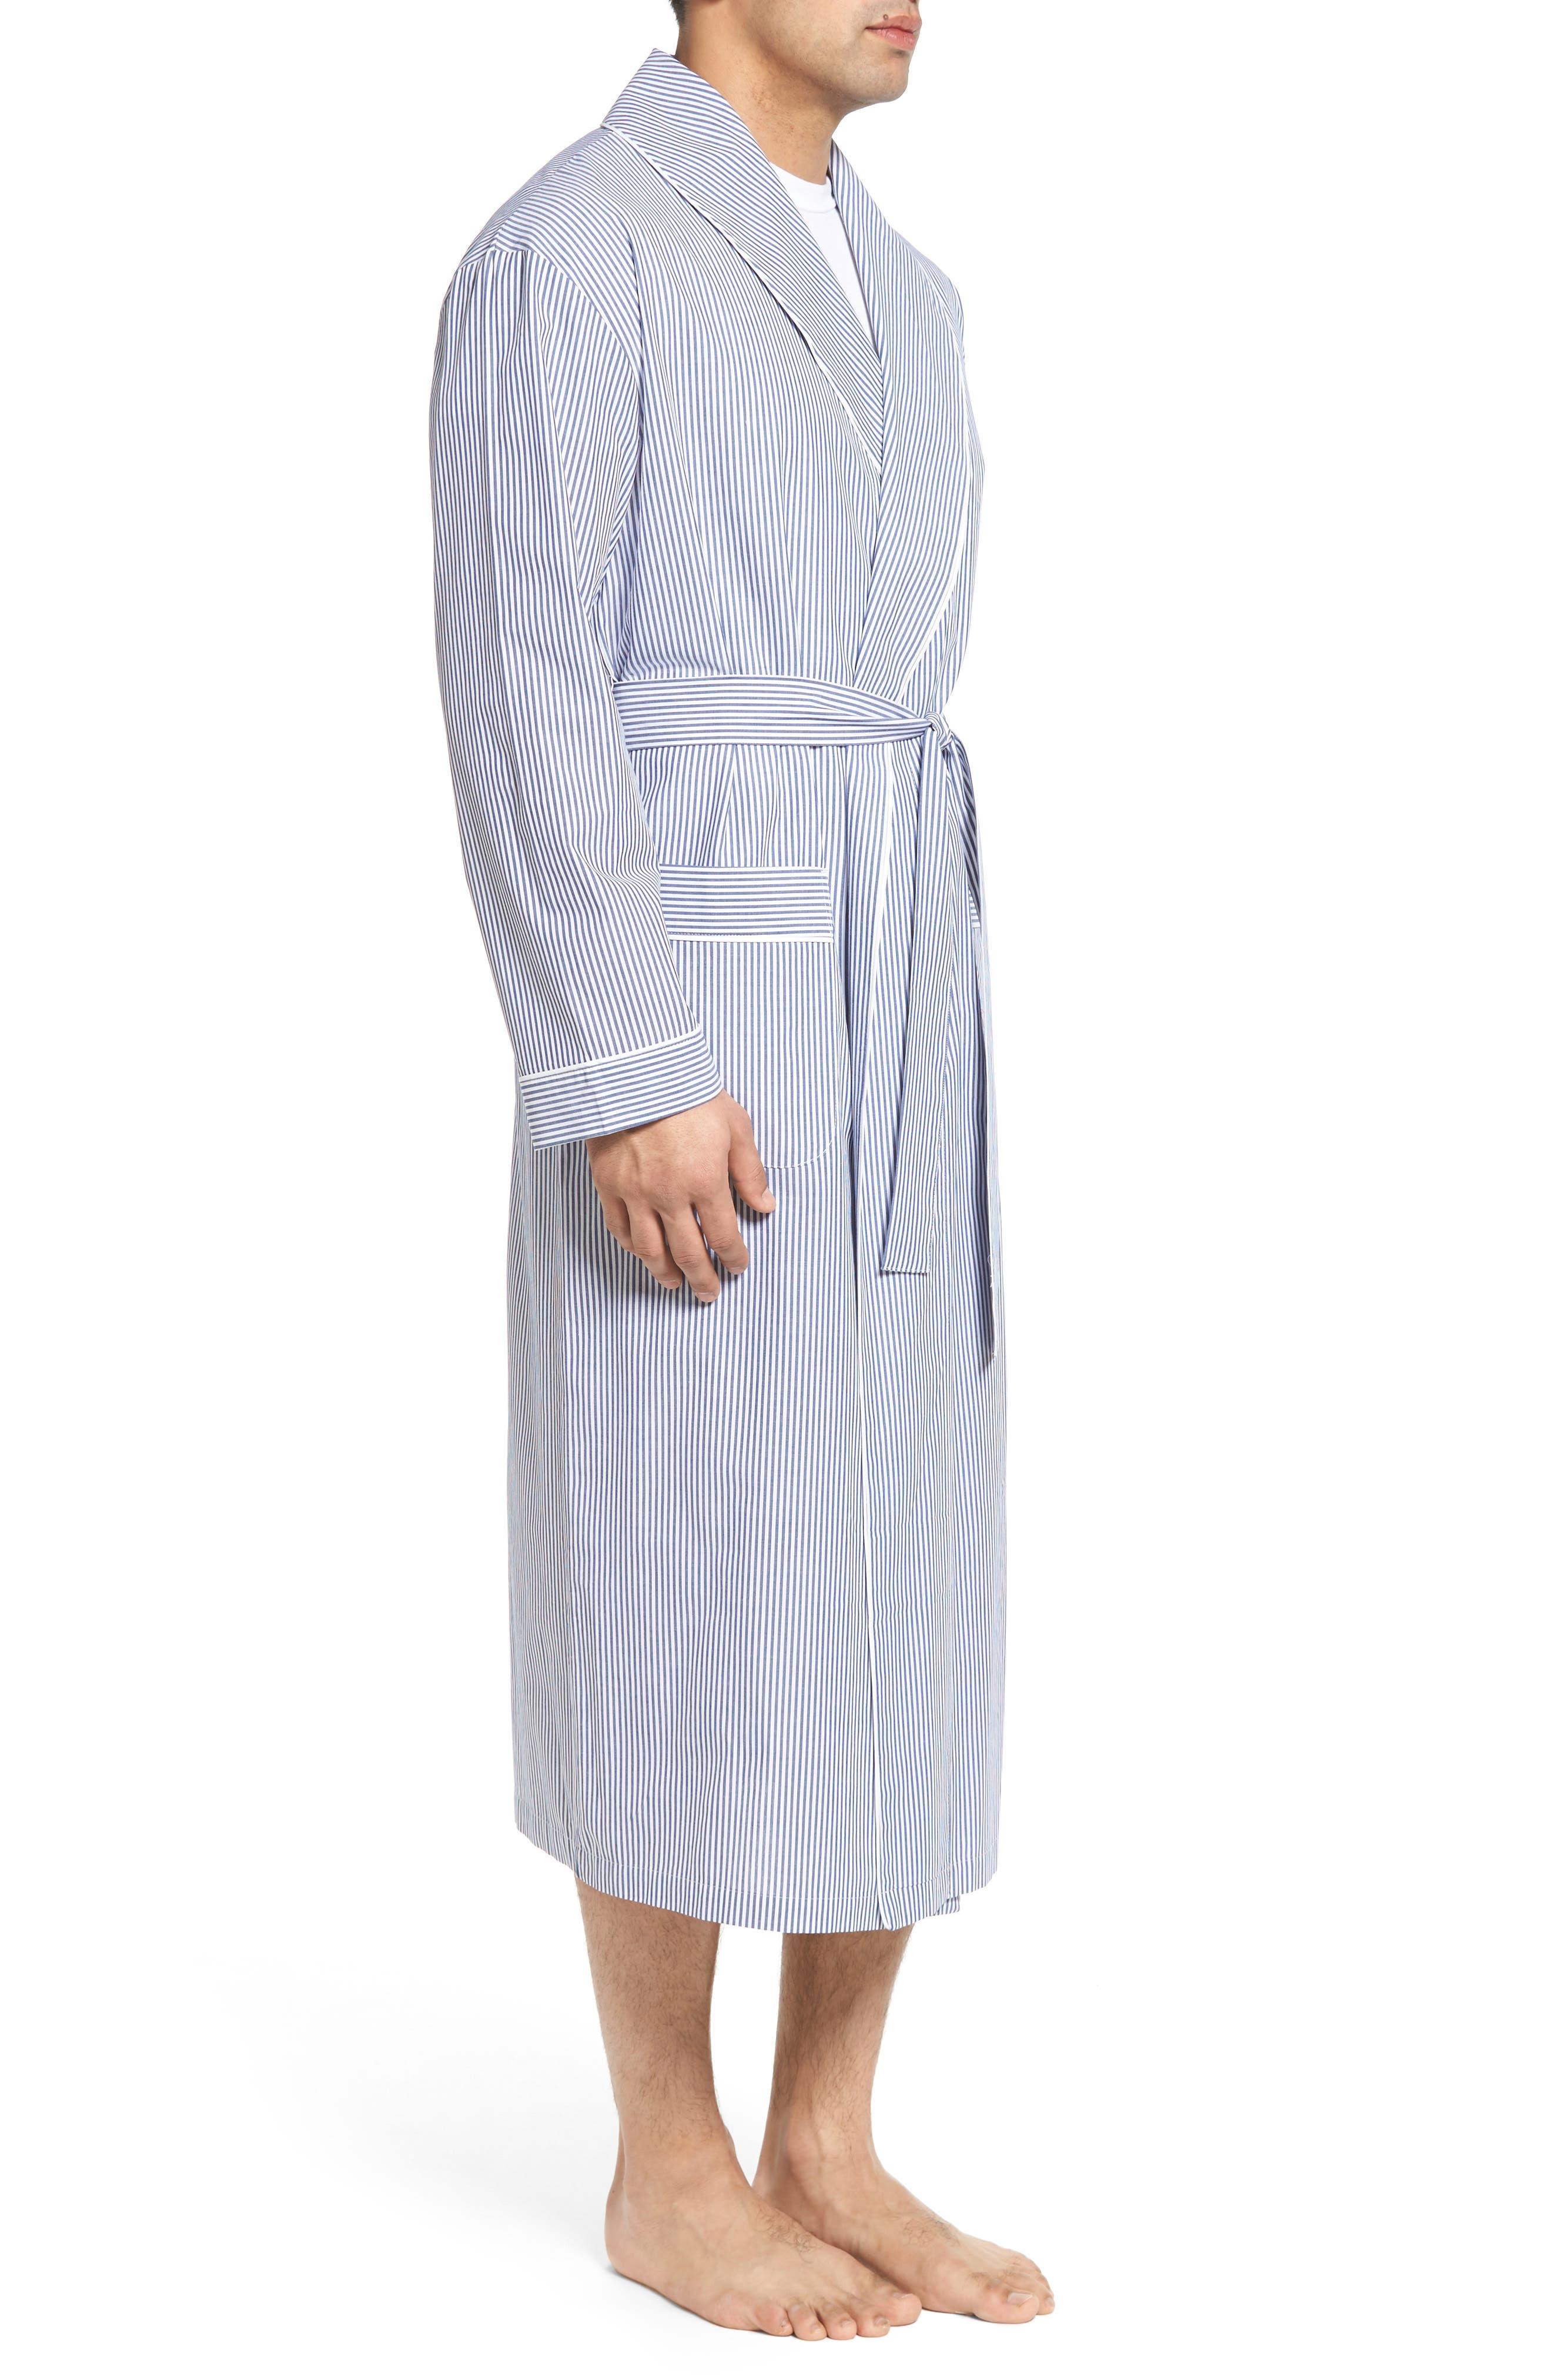 MAJESTIC INTERNATIONAL, Bengal Stripe Robe, Alternate thumbnail 3, color, NAVY/ WHITE